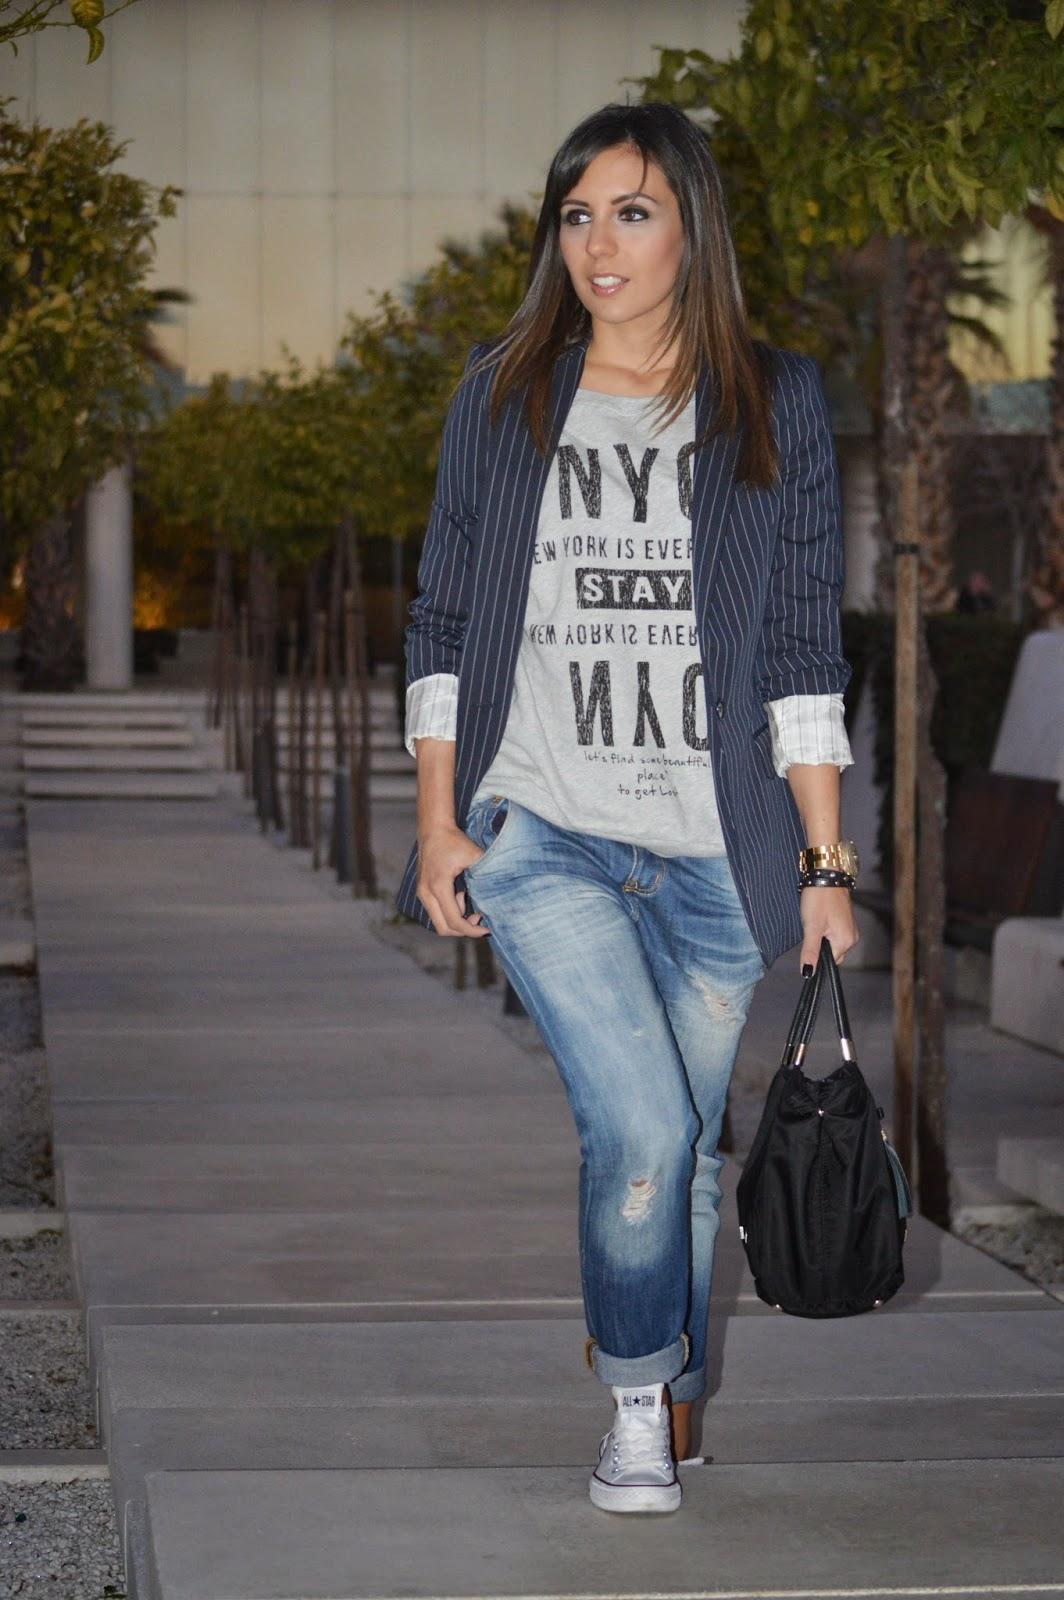 street style style ootd cristina style fashion blogger malagueña blogger malagueña outfit look chic casual tendencias moda mood inspirations purificacion garcia blazer converse zara mango